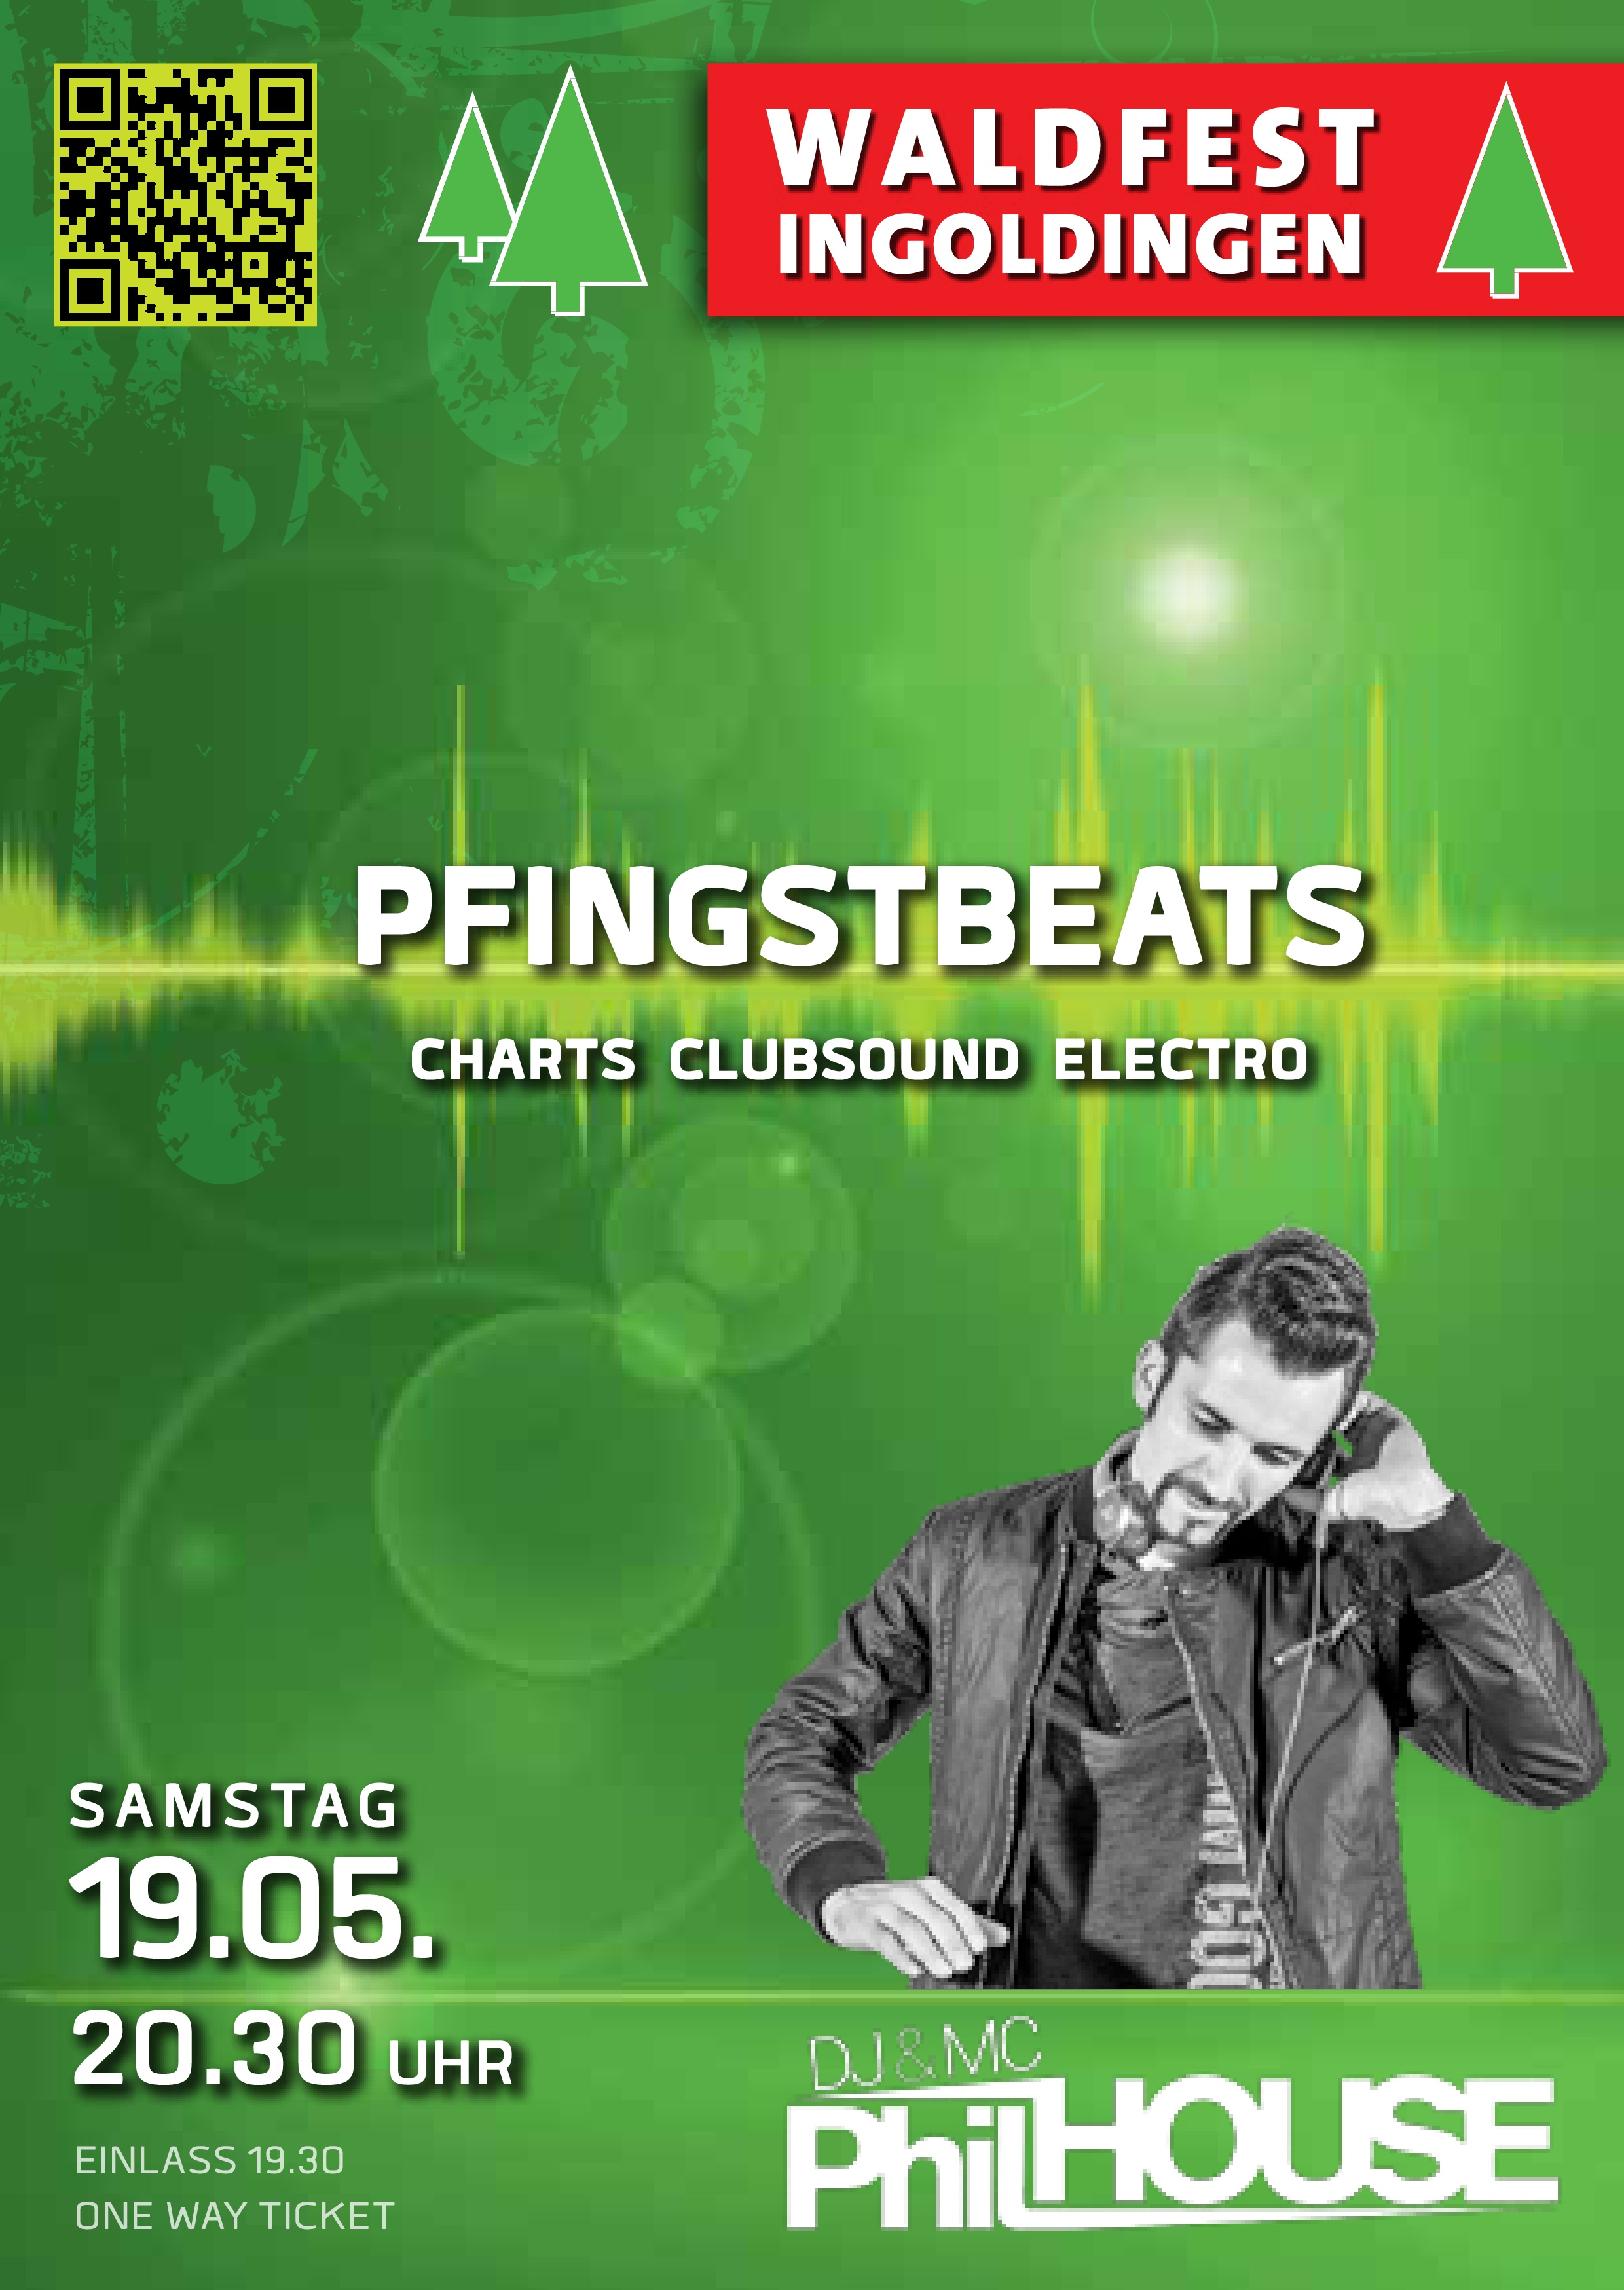 Pfingstbeats_Waldfest_Samstag.jpg